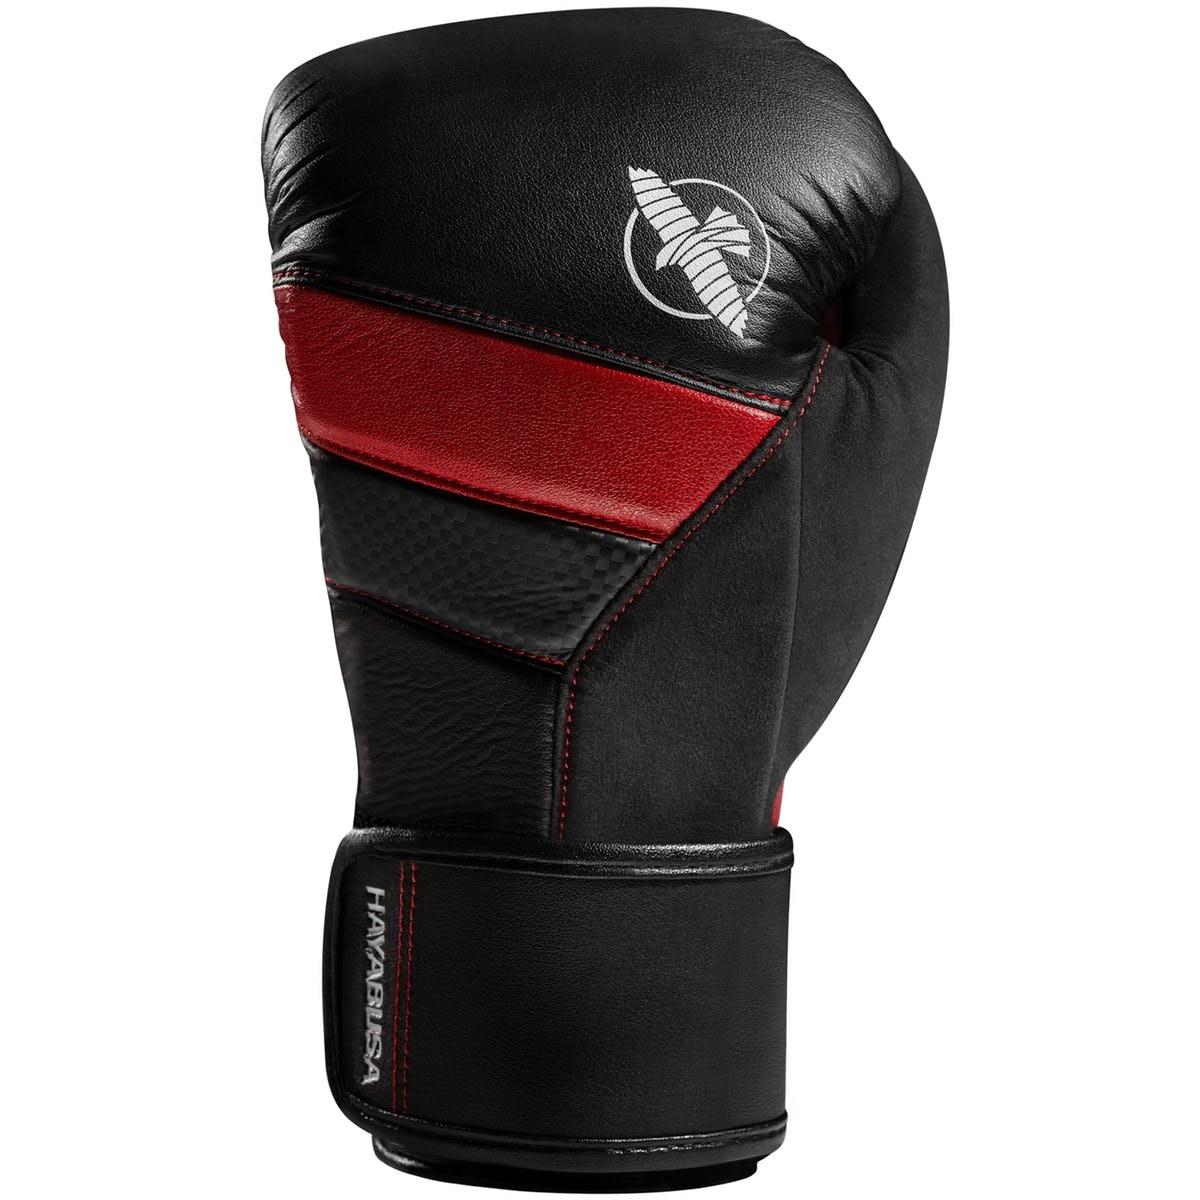 Hayabusa-T3-Dual-X-Hook-and-Loop-Closure-Vylar-Leather-Training-Boxing-Gloves thumbnail 20